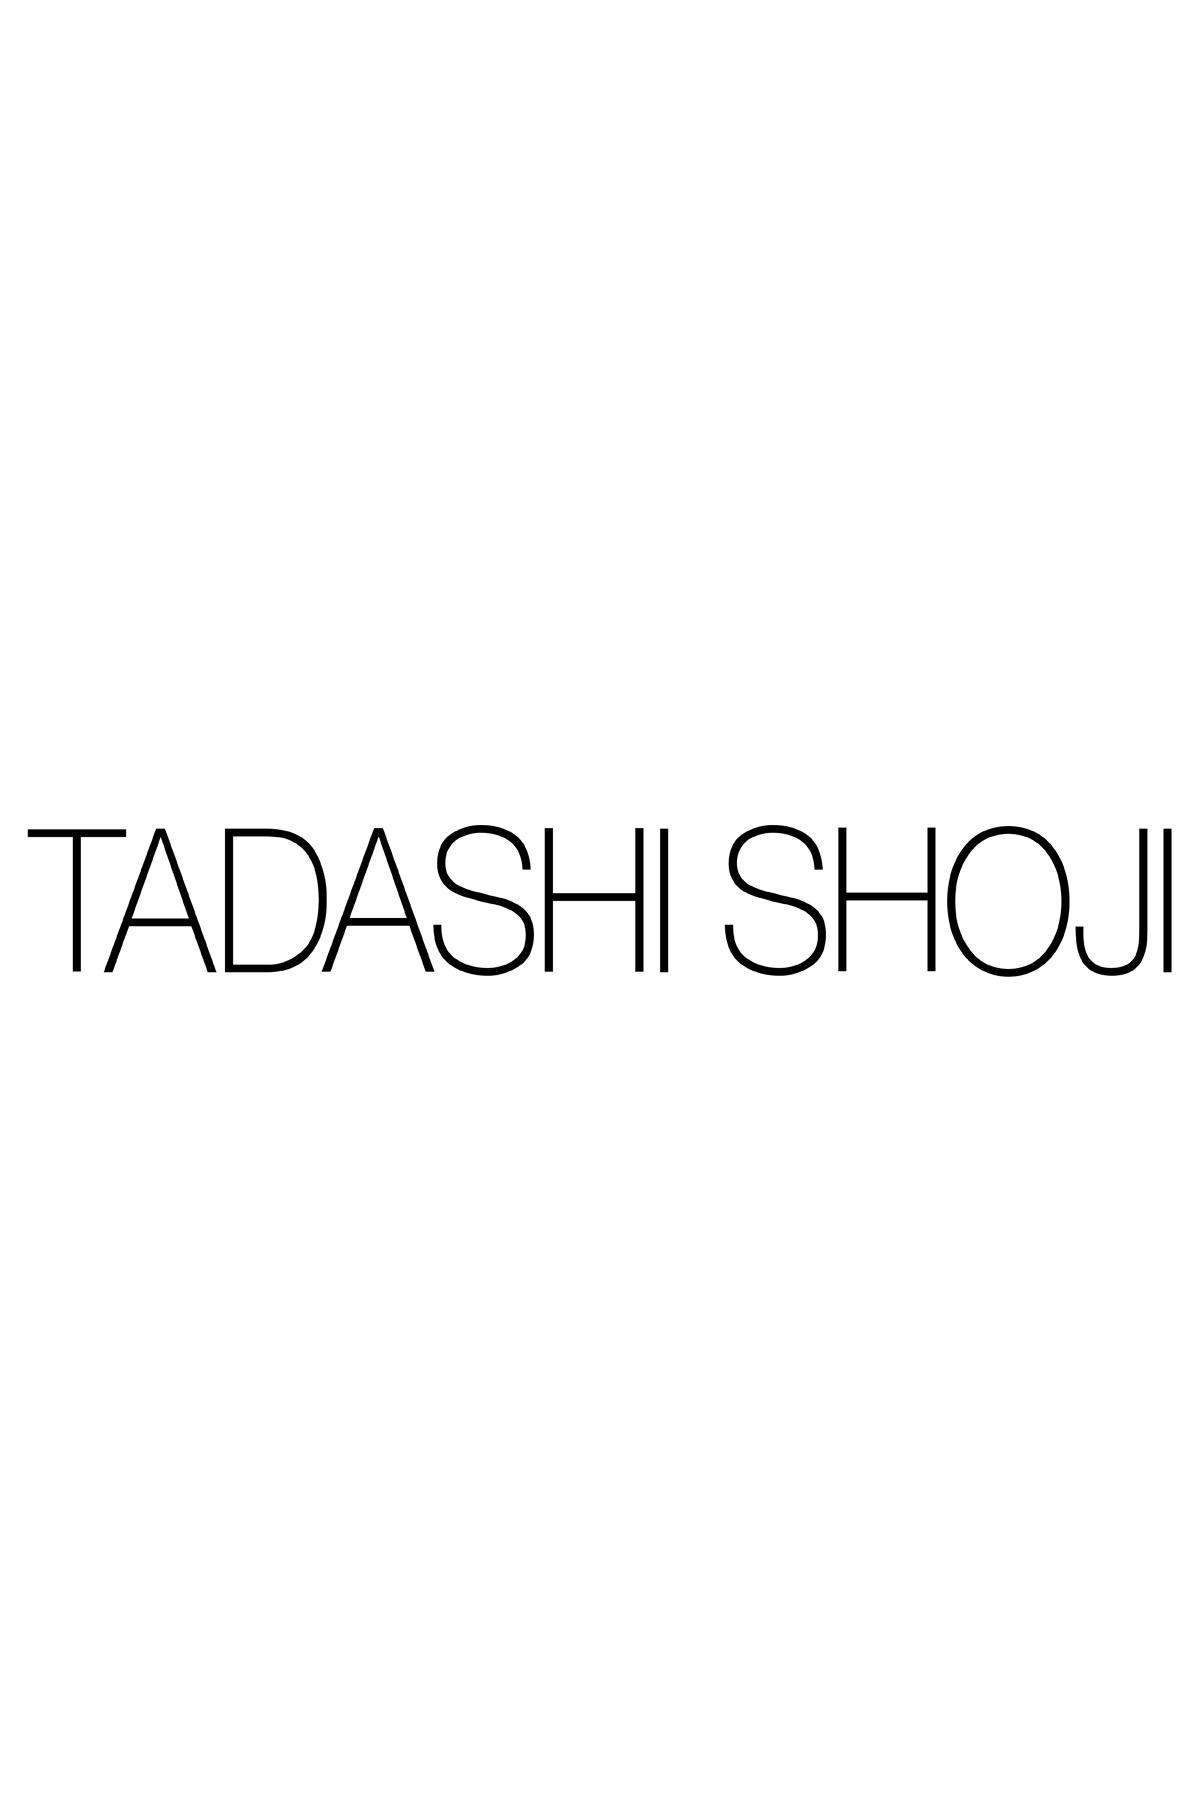 Corded Embroidery on Tulle Cap Sleeve Dress | Tadashi Shoji